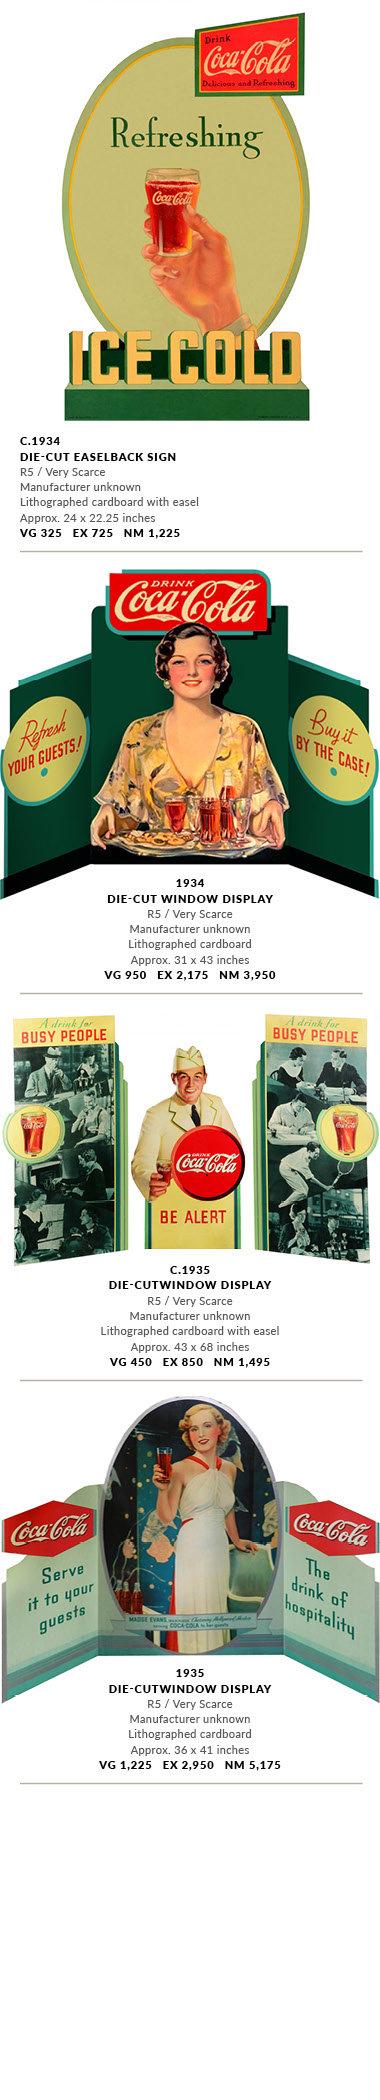 1930-1949DieCutsPHONE_7.jpg